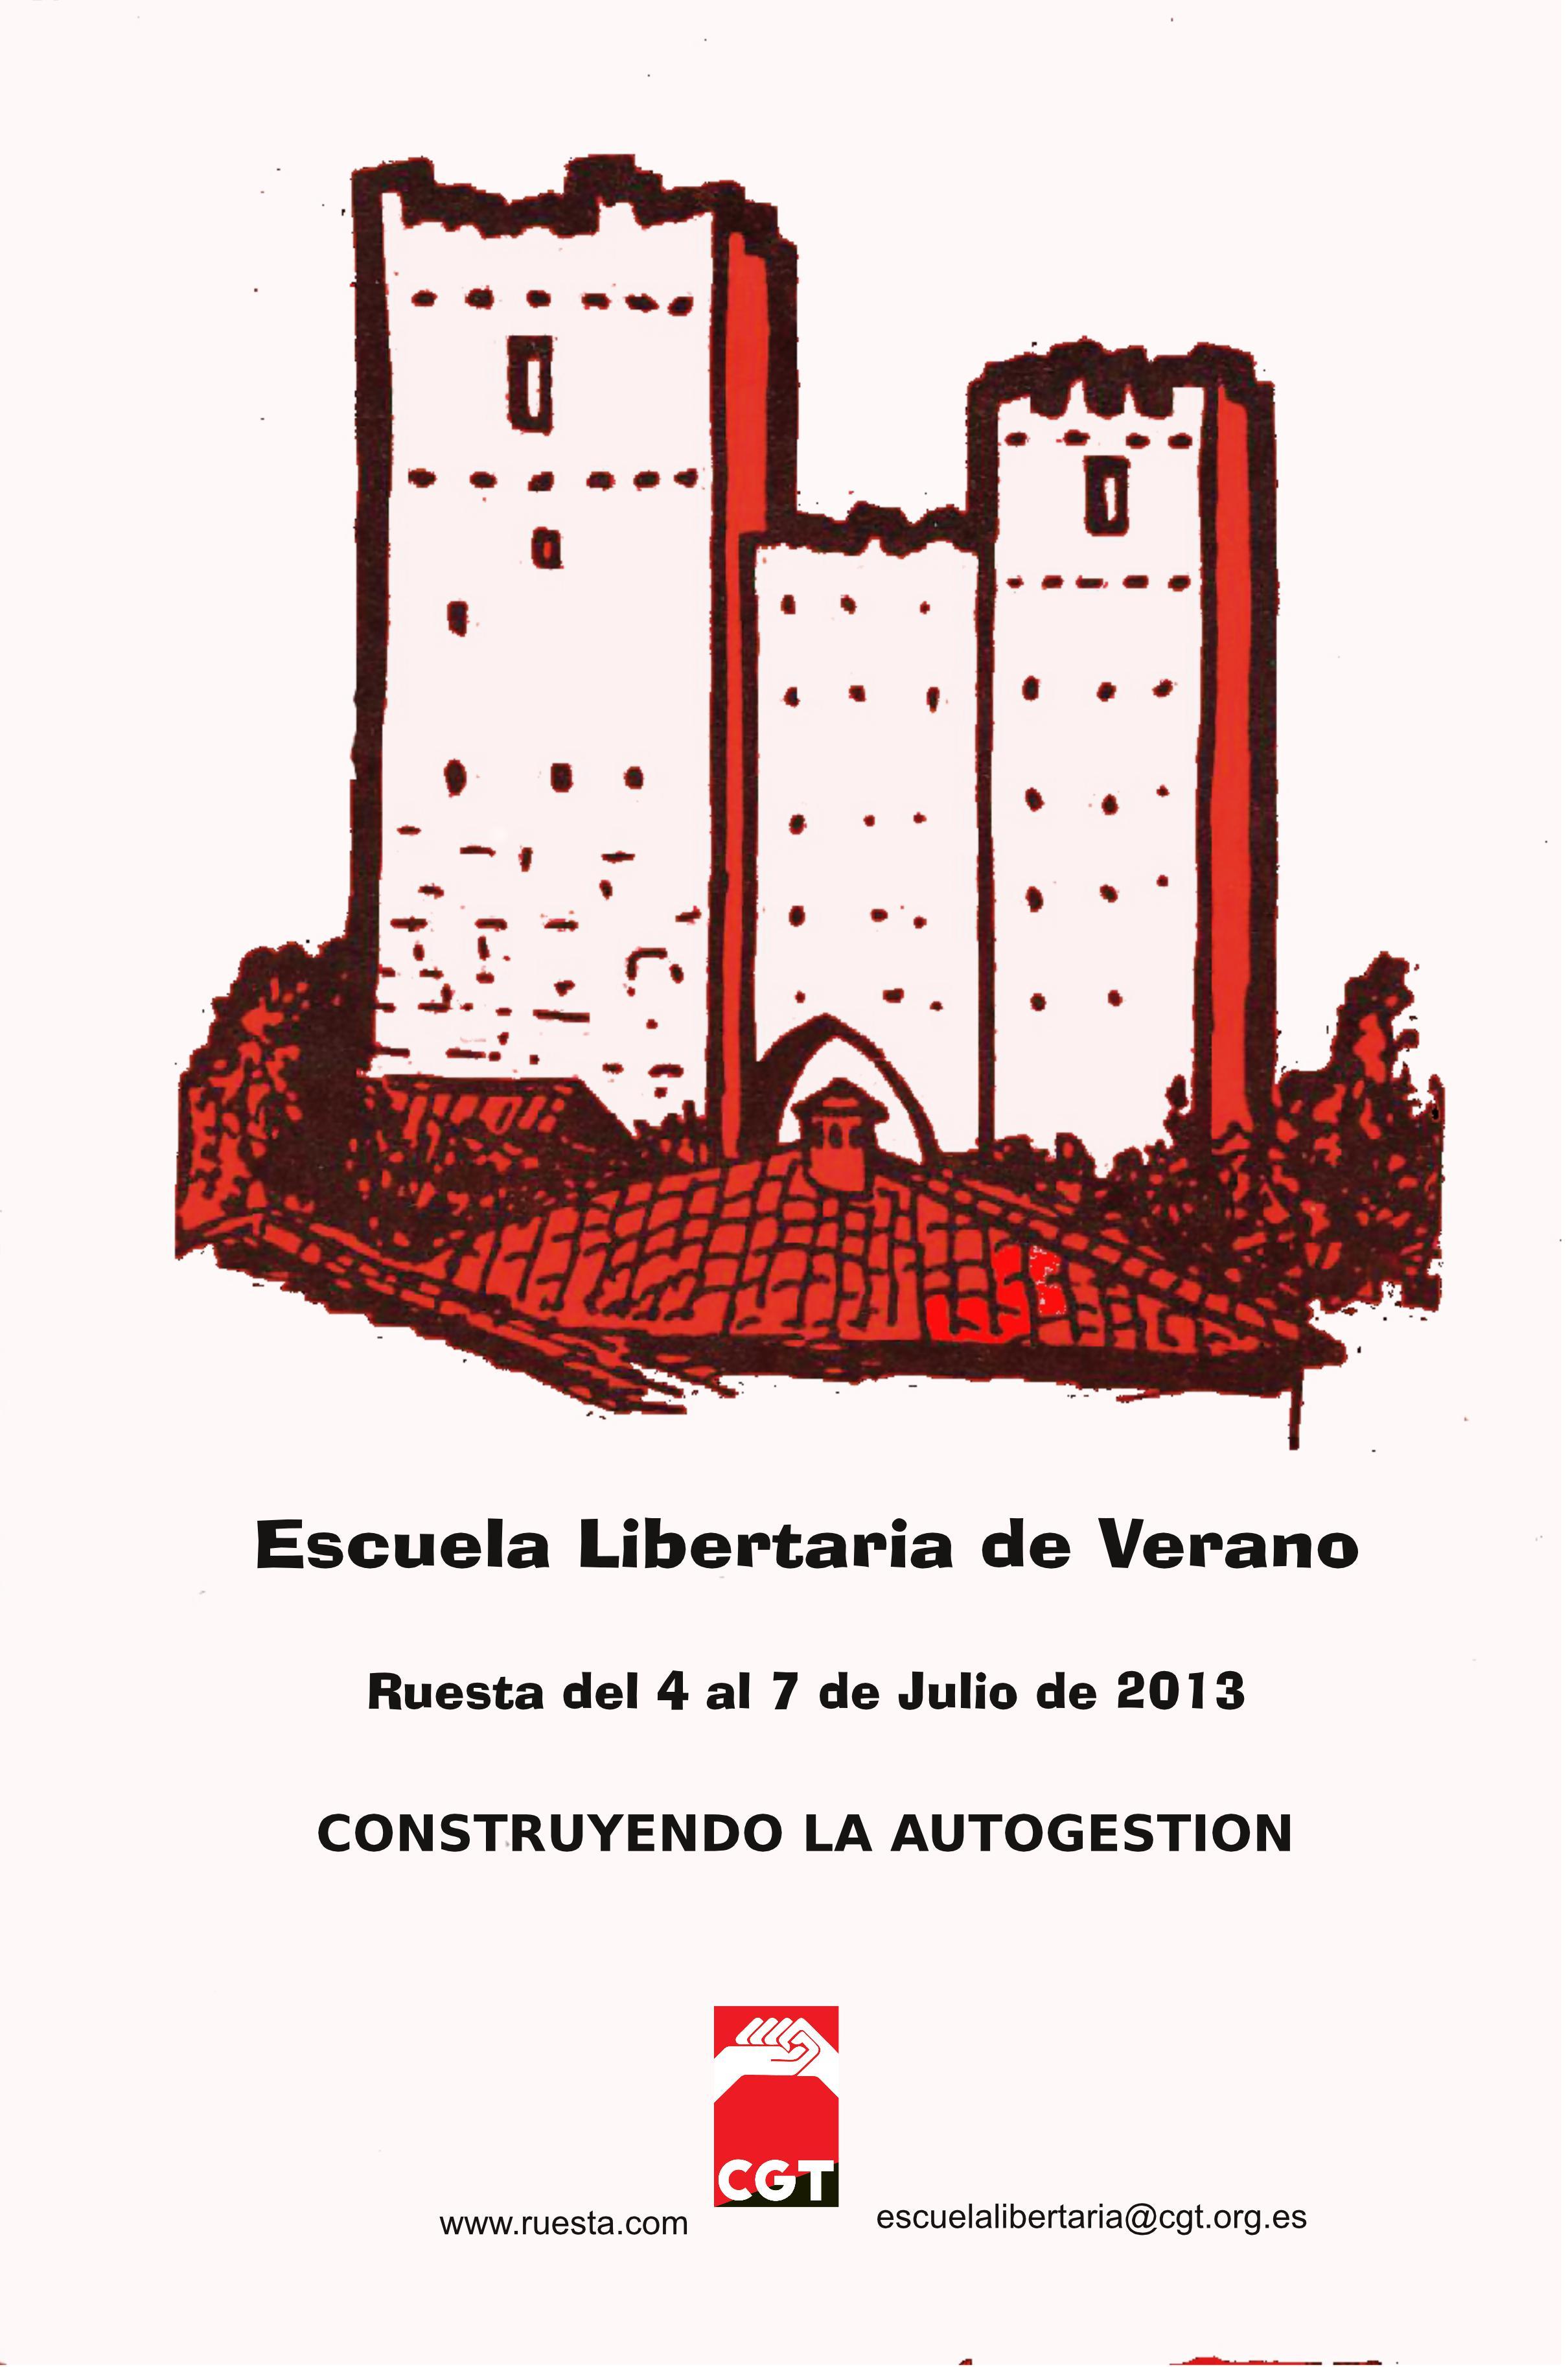 Escuela Libertaria de verano 2013